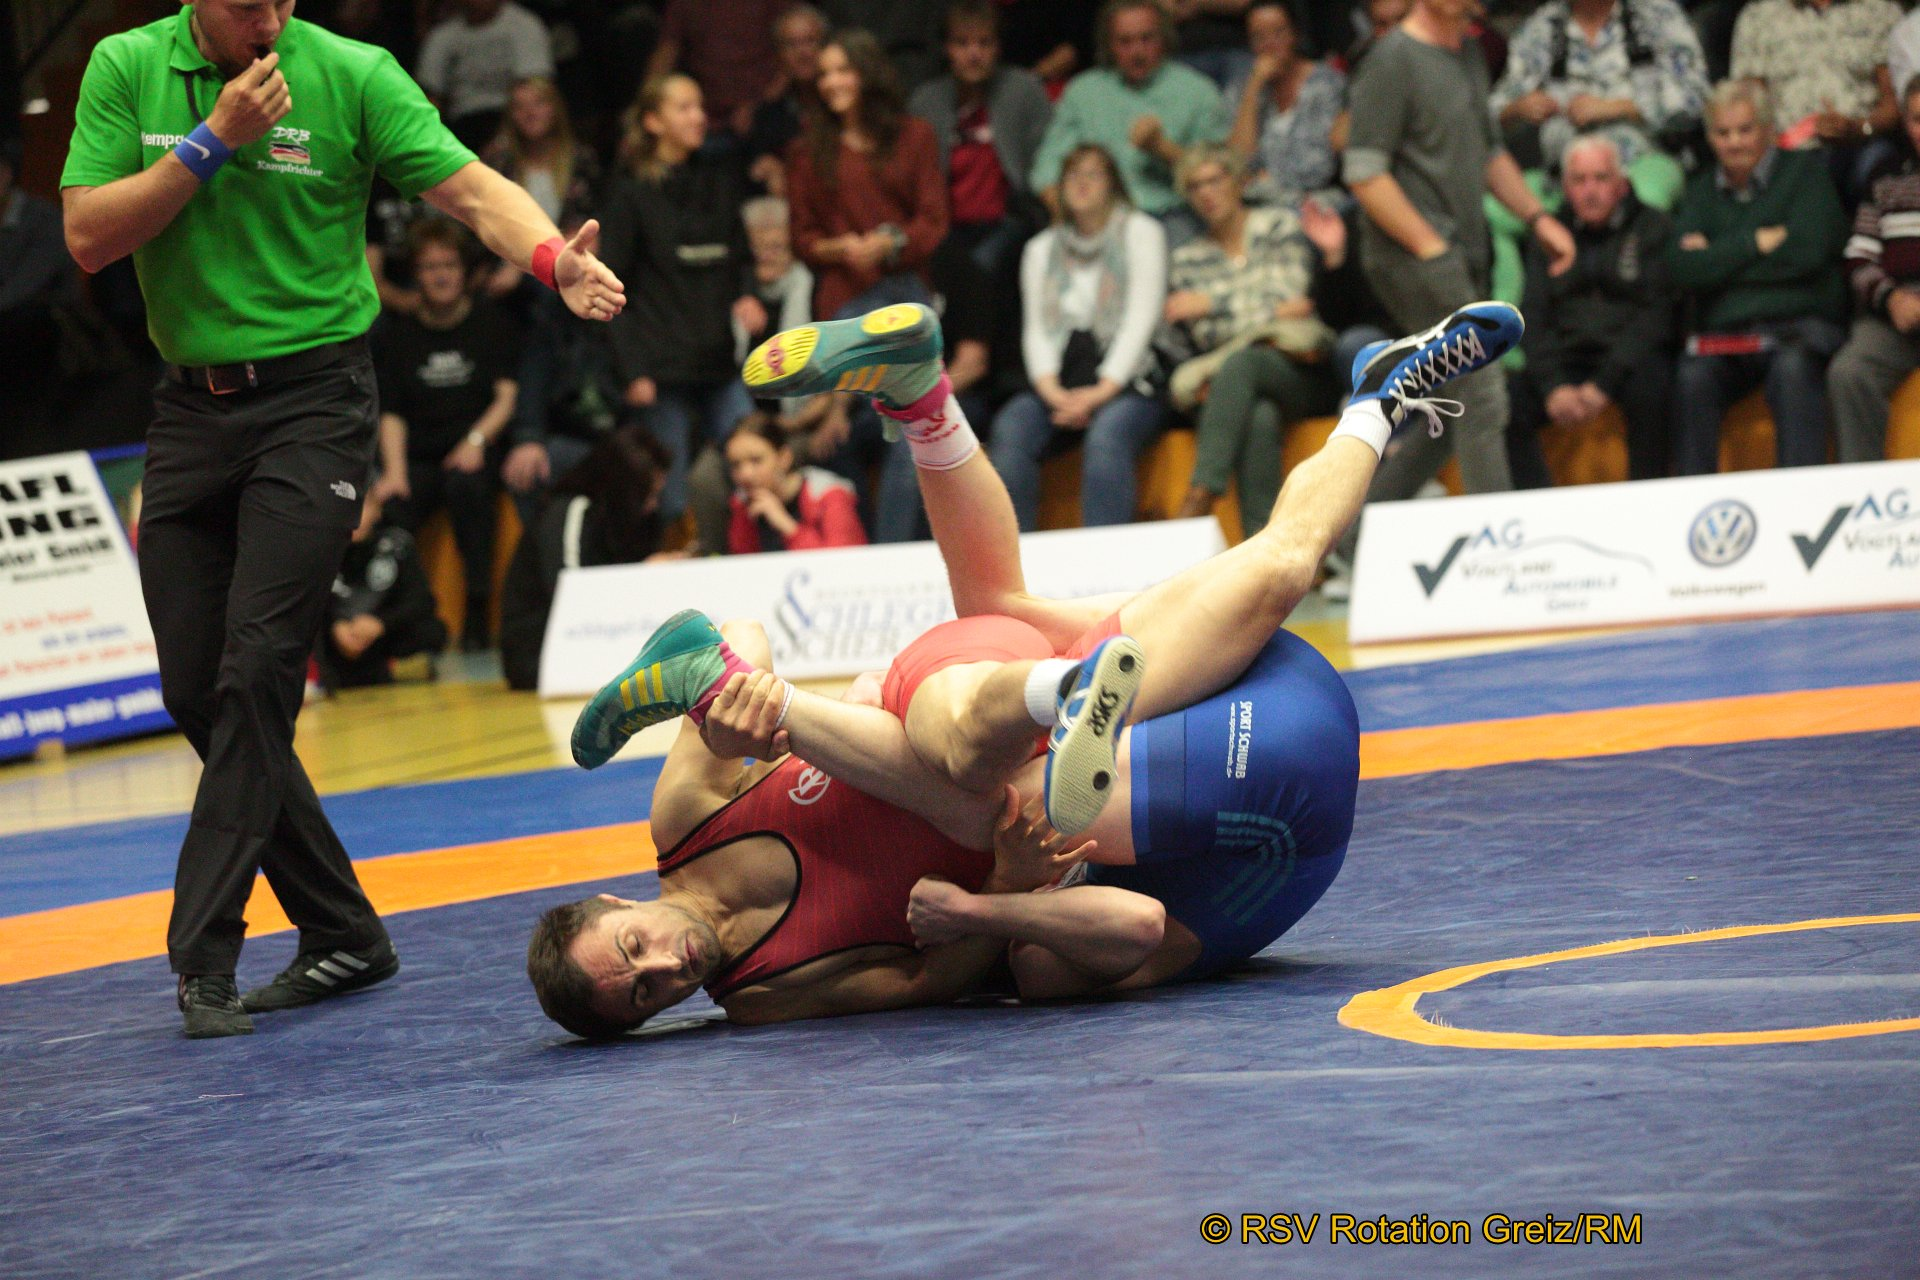 66kg Freistil: Vladimir Gotisan EU (5) (rotes Trikot), RSV Rotation Greiz gegen Vladislav Wagner (2), ASV Schorndorf 4:0/TÜ/16:0/03:00